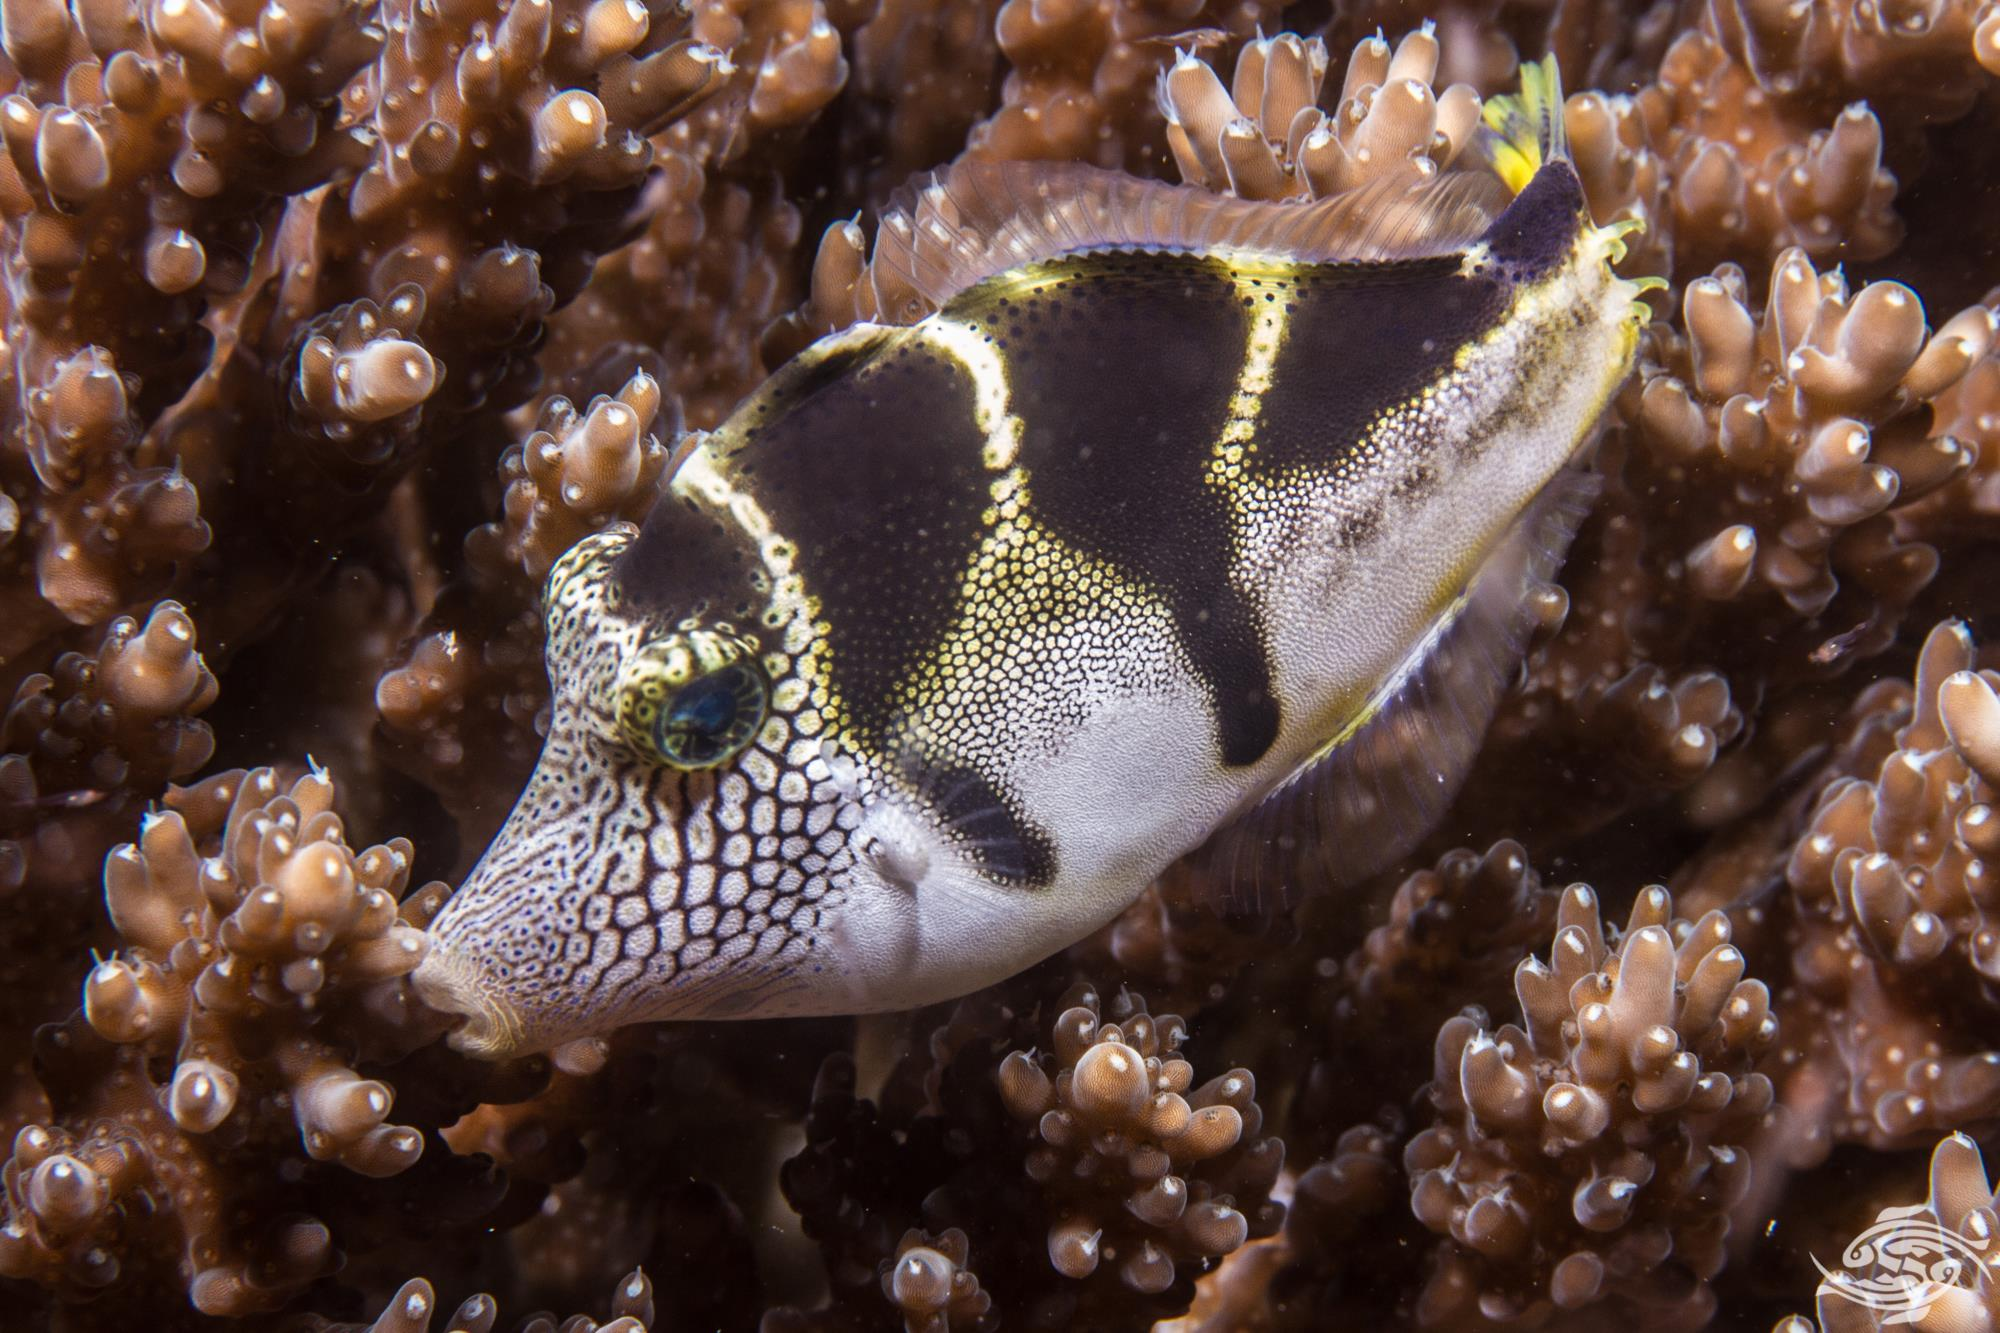 mimick filefish or black saddled filefish (Paraluteres prionurus)